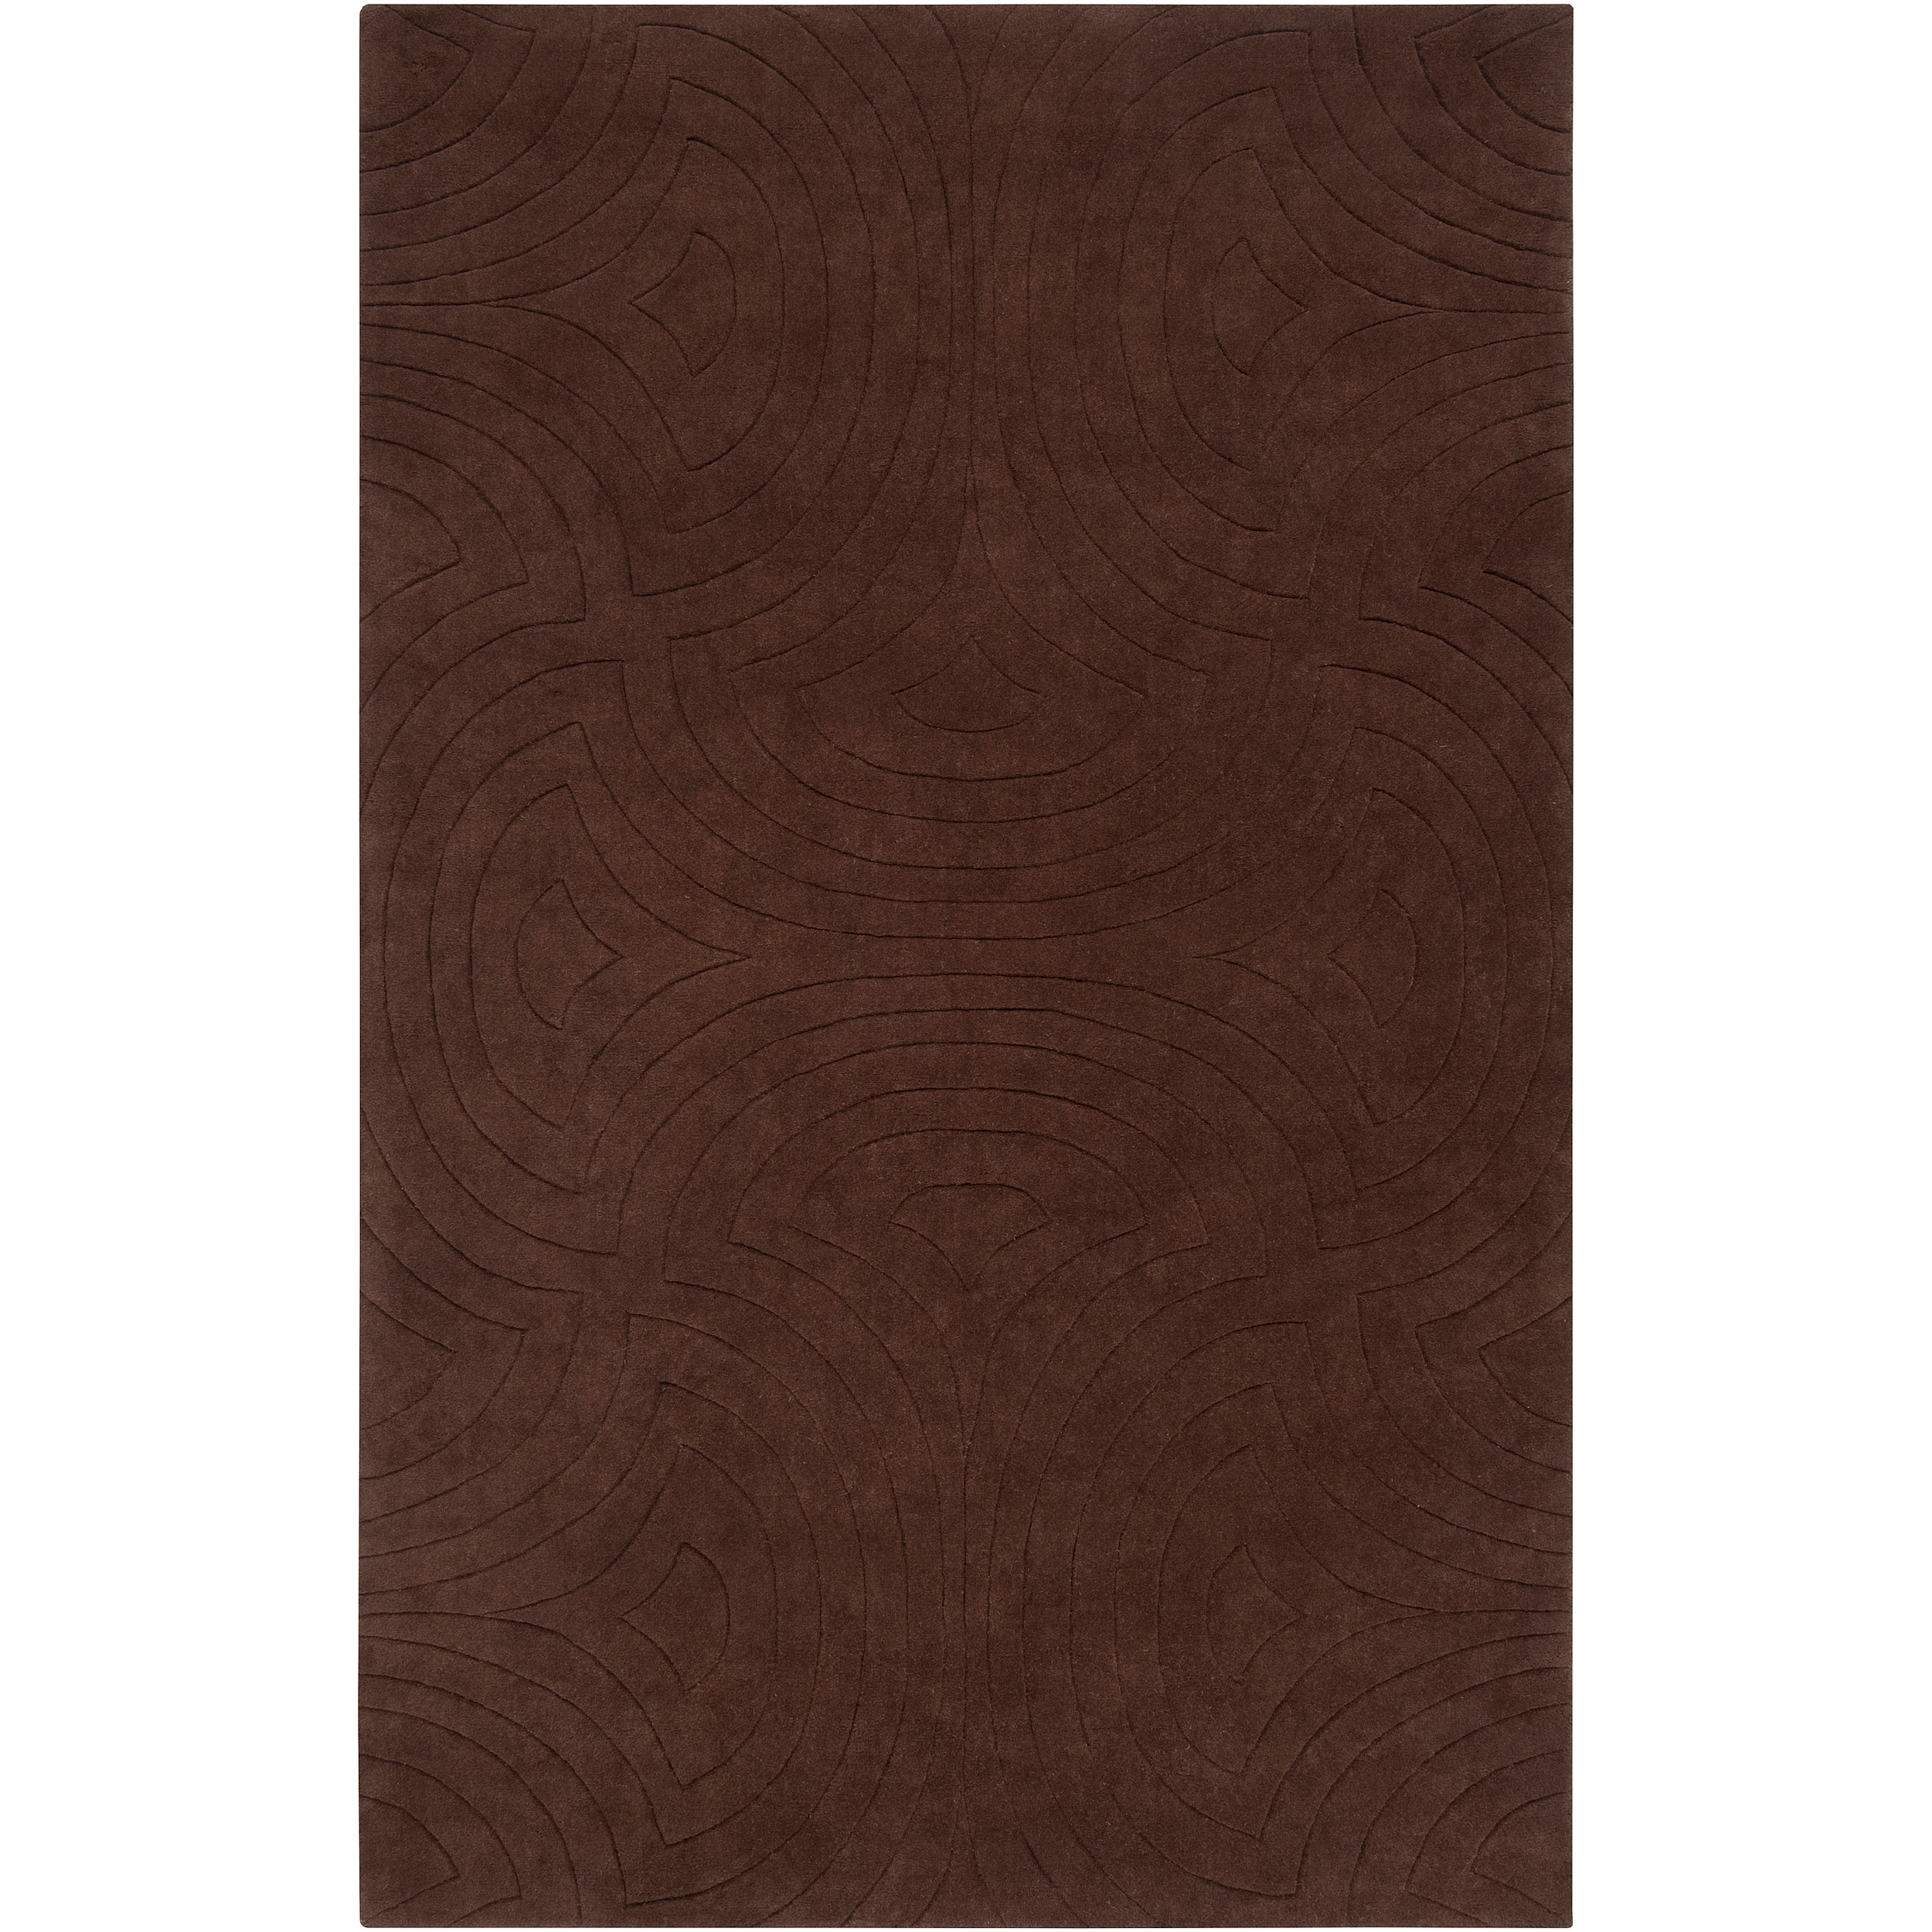 Candice Olson Loomed 'Scuddle' Brown Geometric Plush Wool Rug (9' x 13')